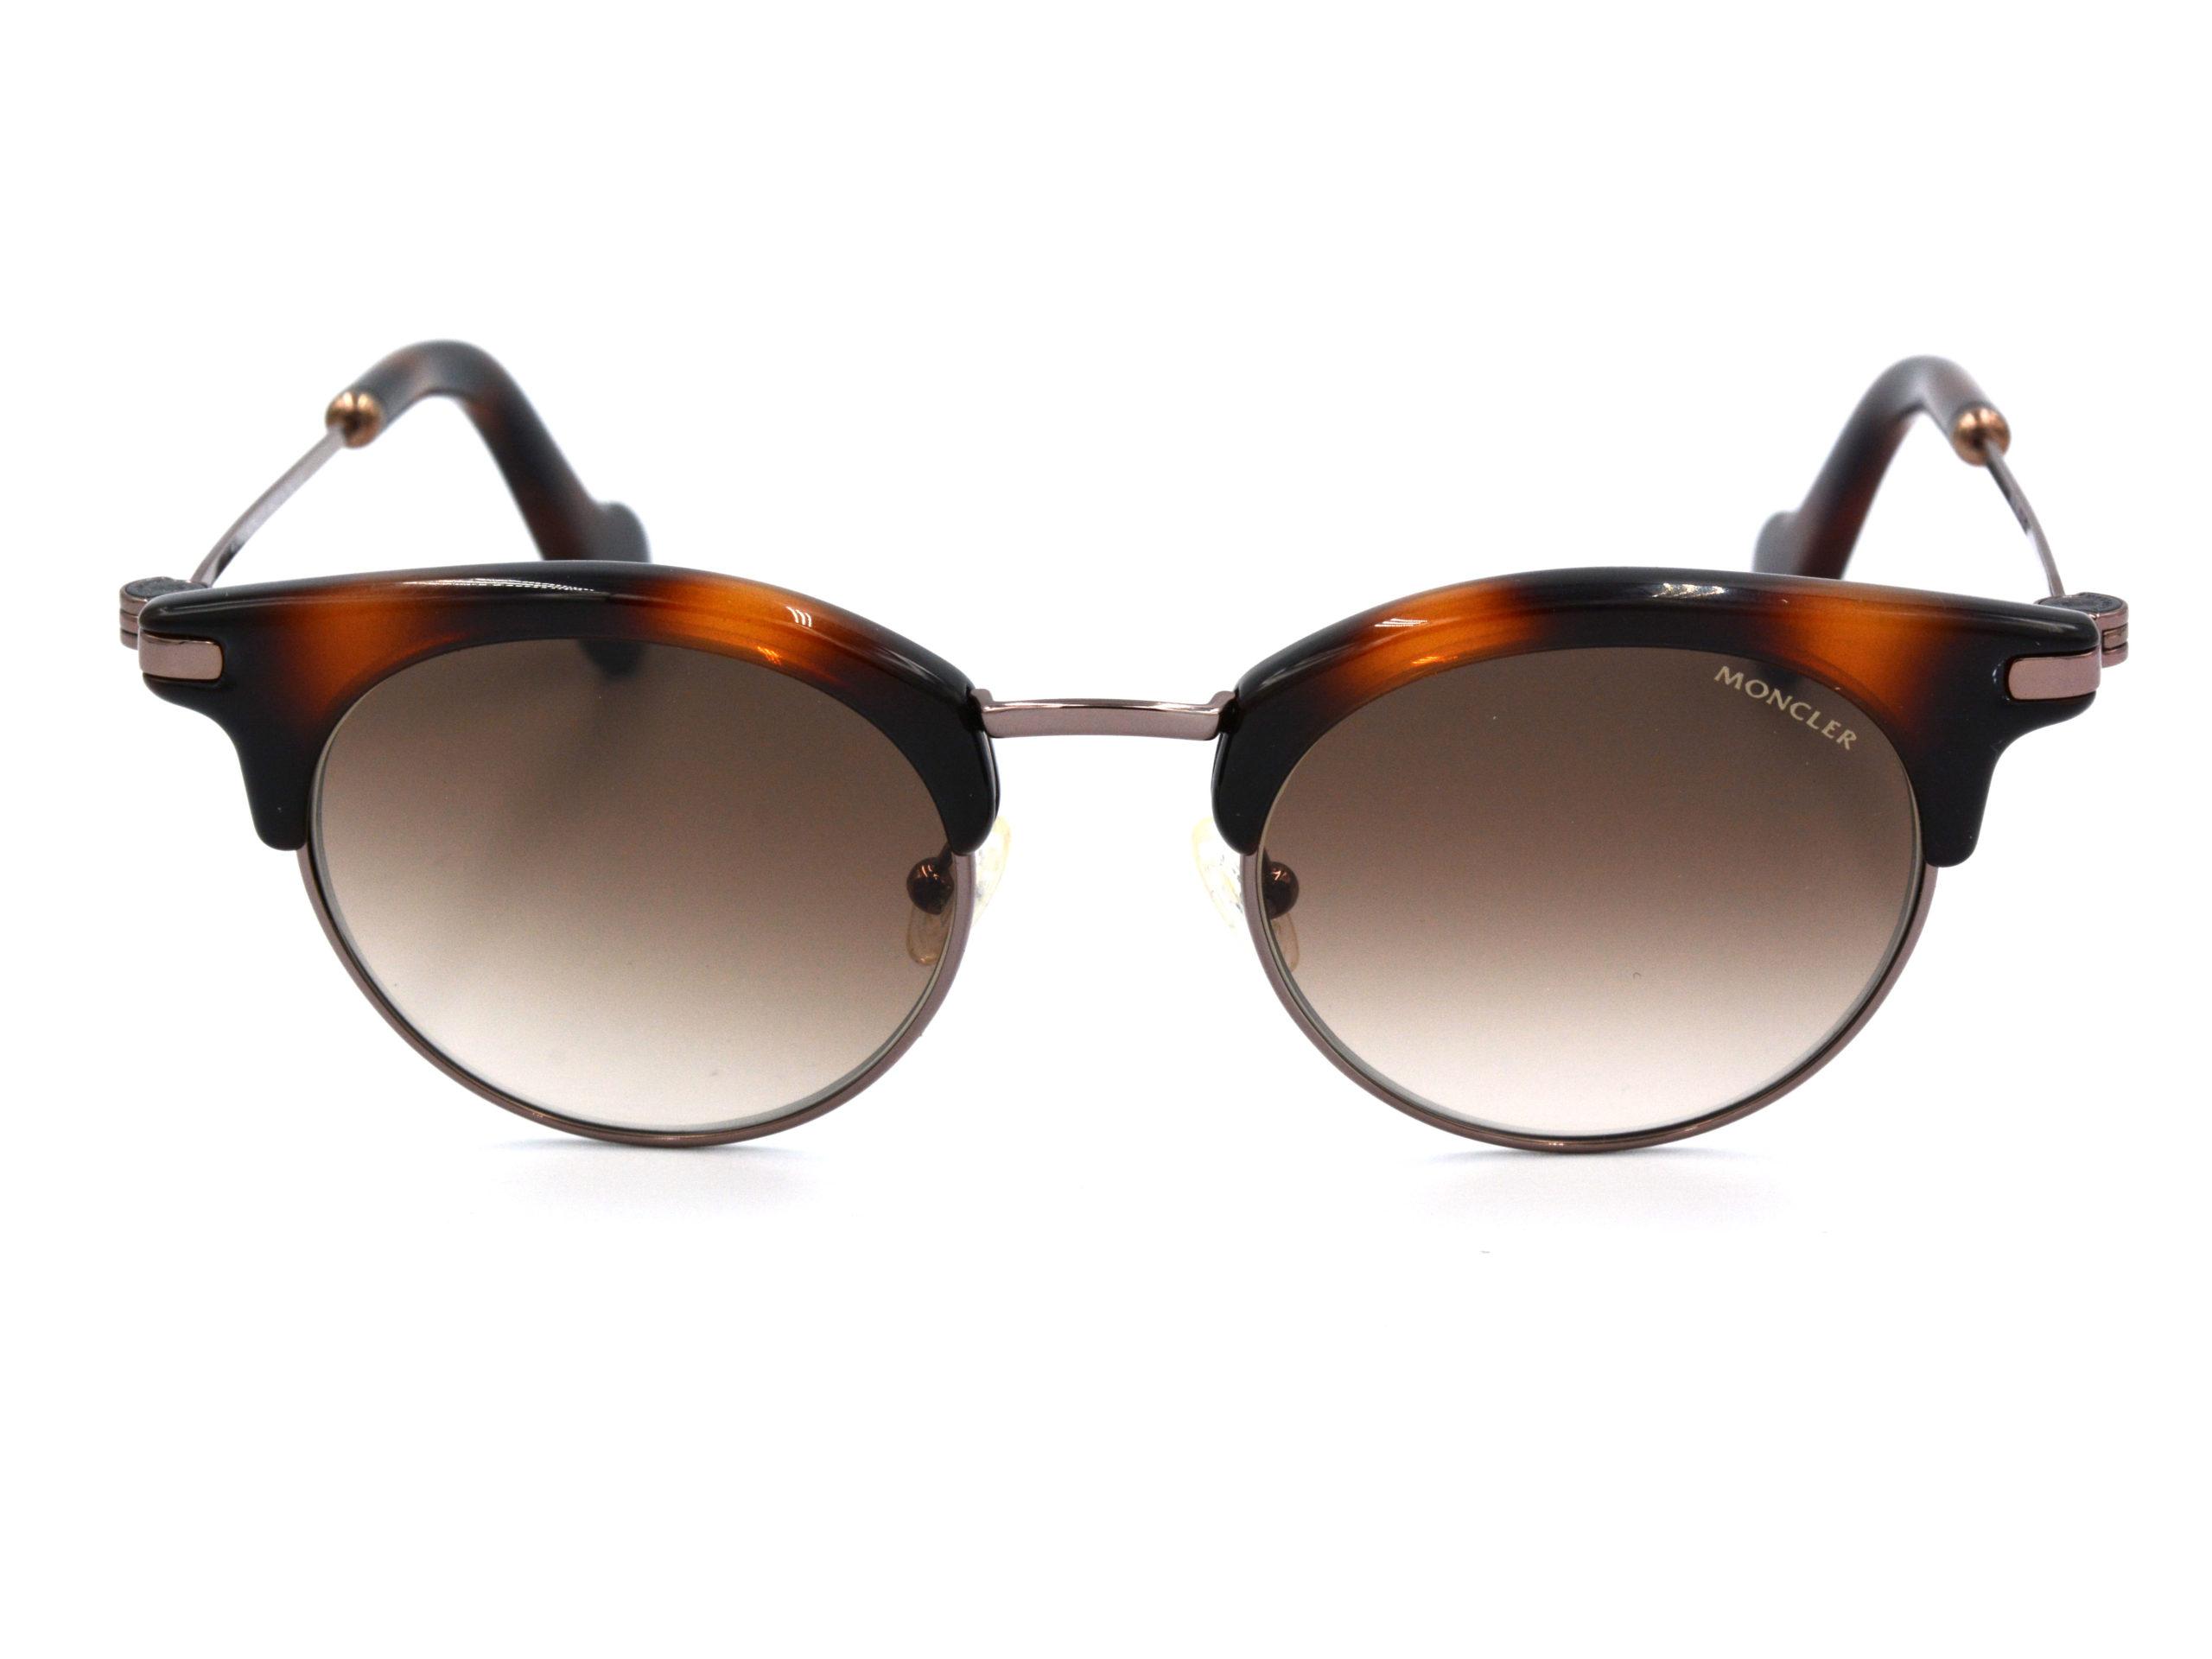 Sunglasses MONCLER ML0035 52F 47-20-145 Piraeus